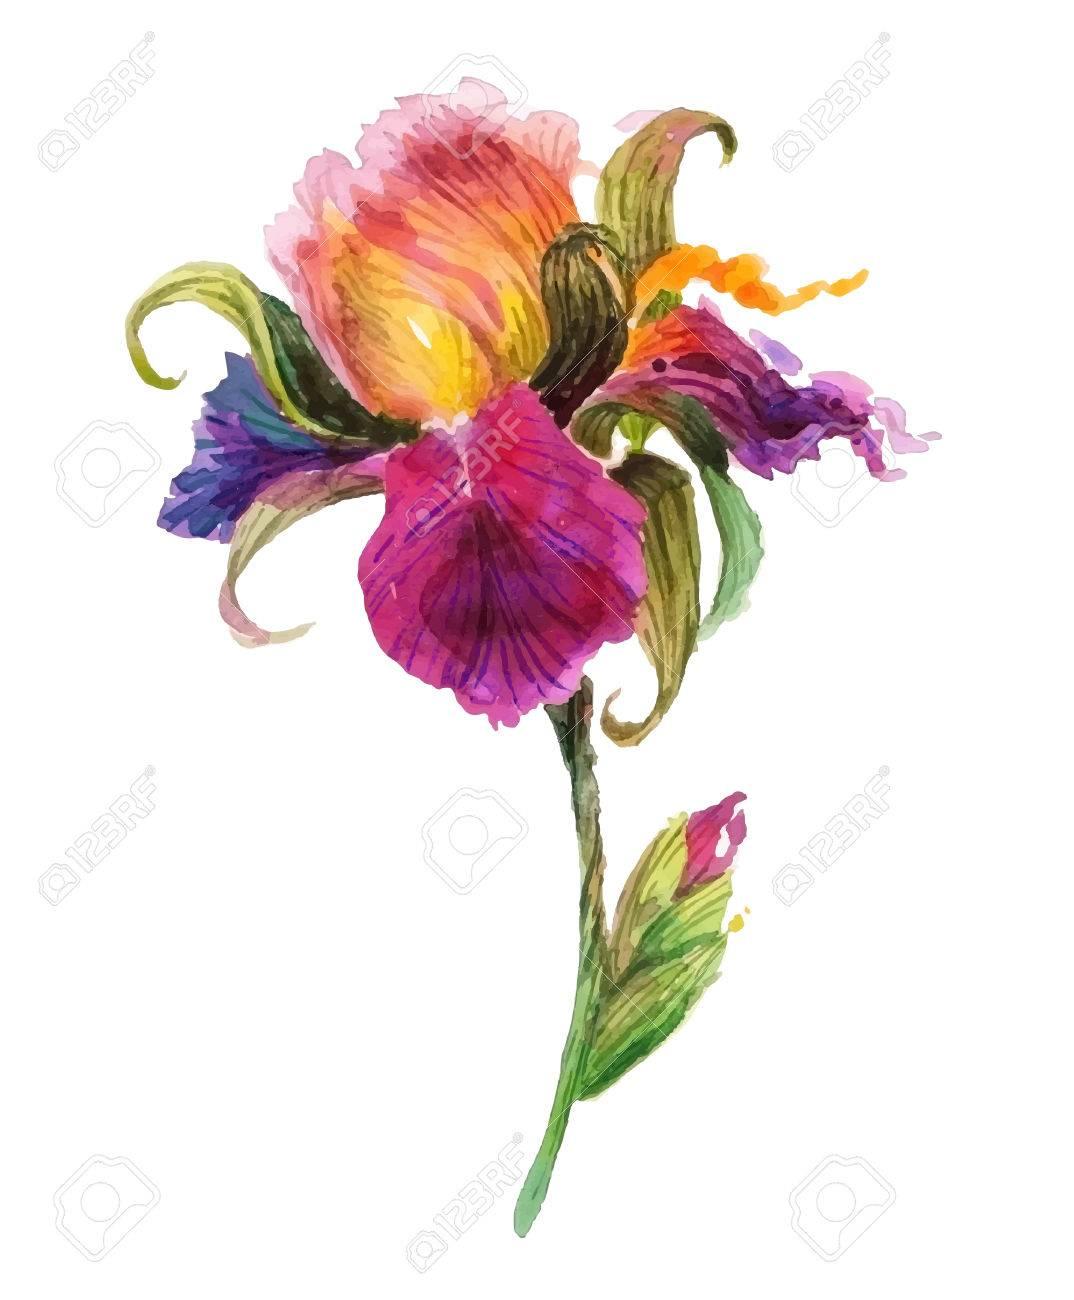 Beautiful watercolor iris flower. Watercolor floral illustration. - 42045704